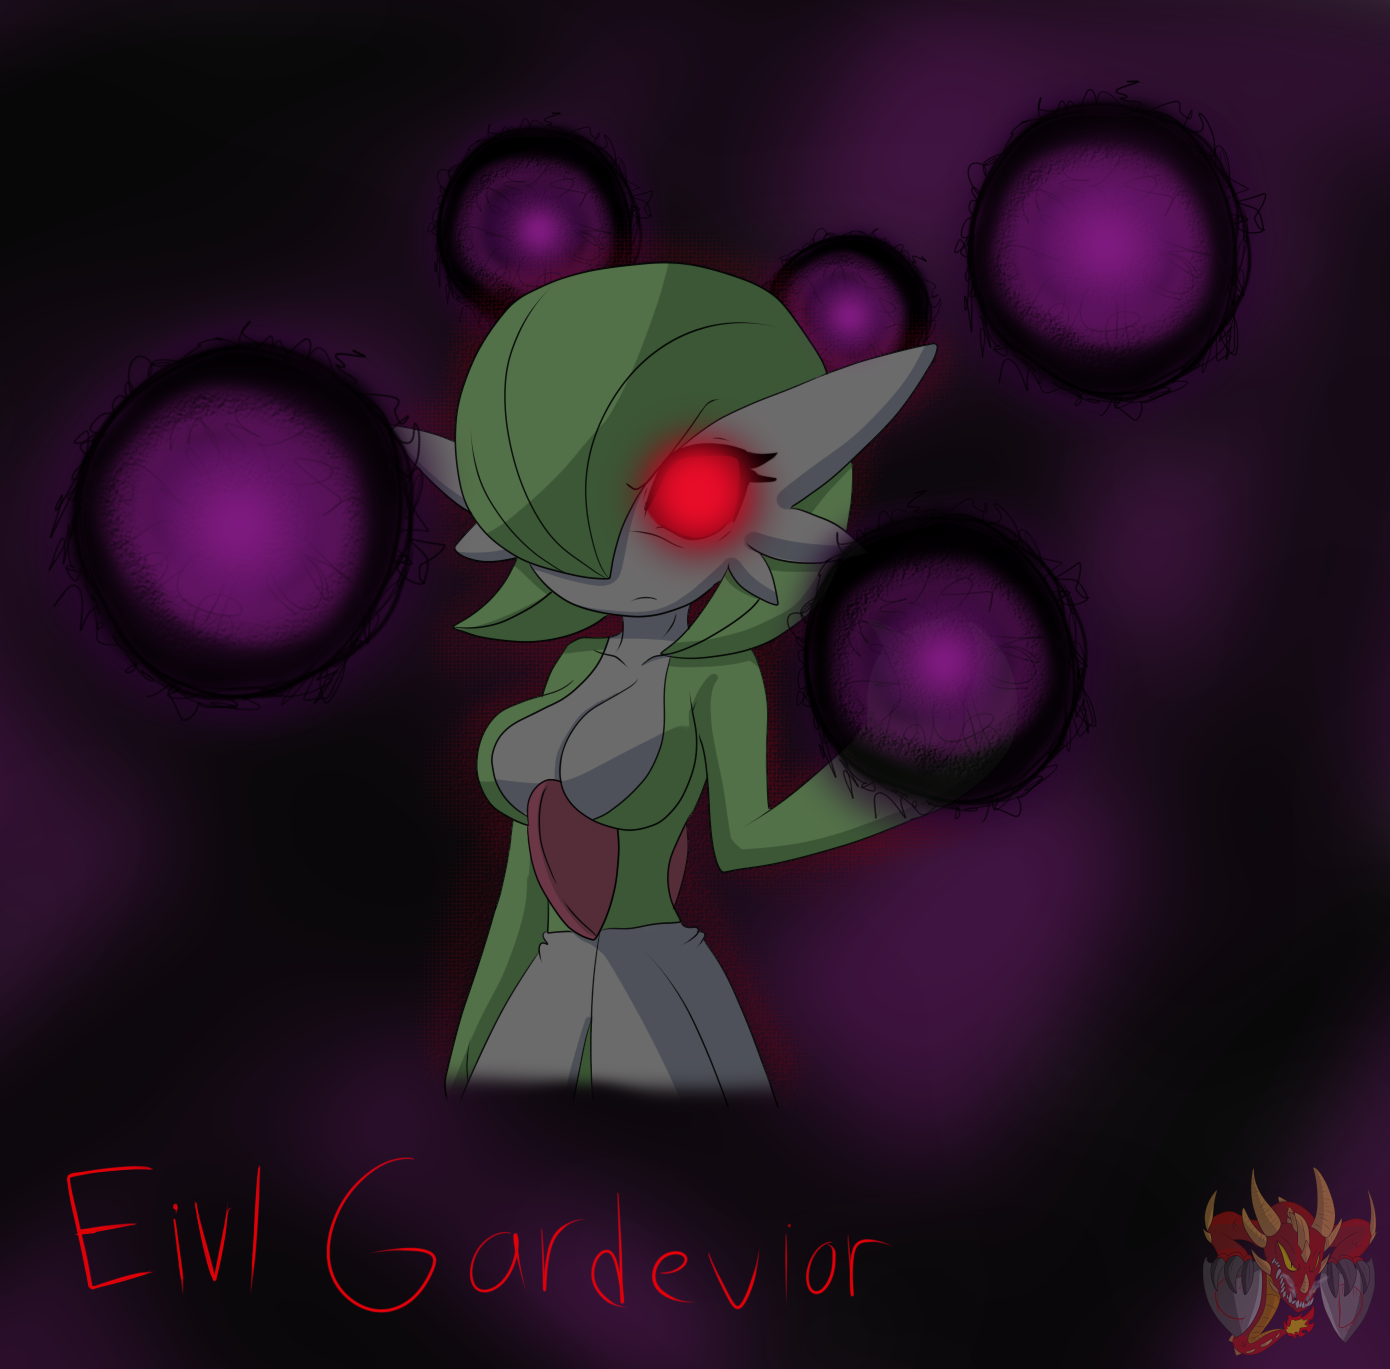 evil pokemon wallpaper - photo #34